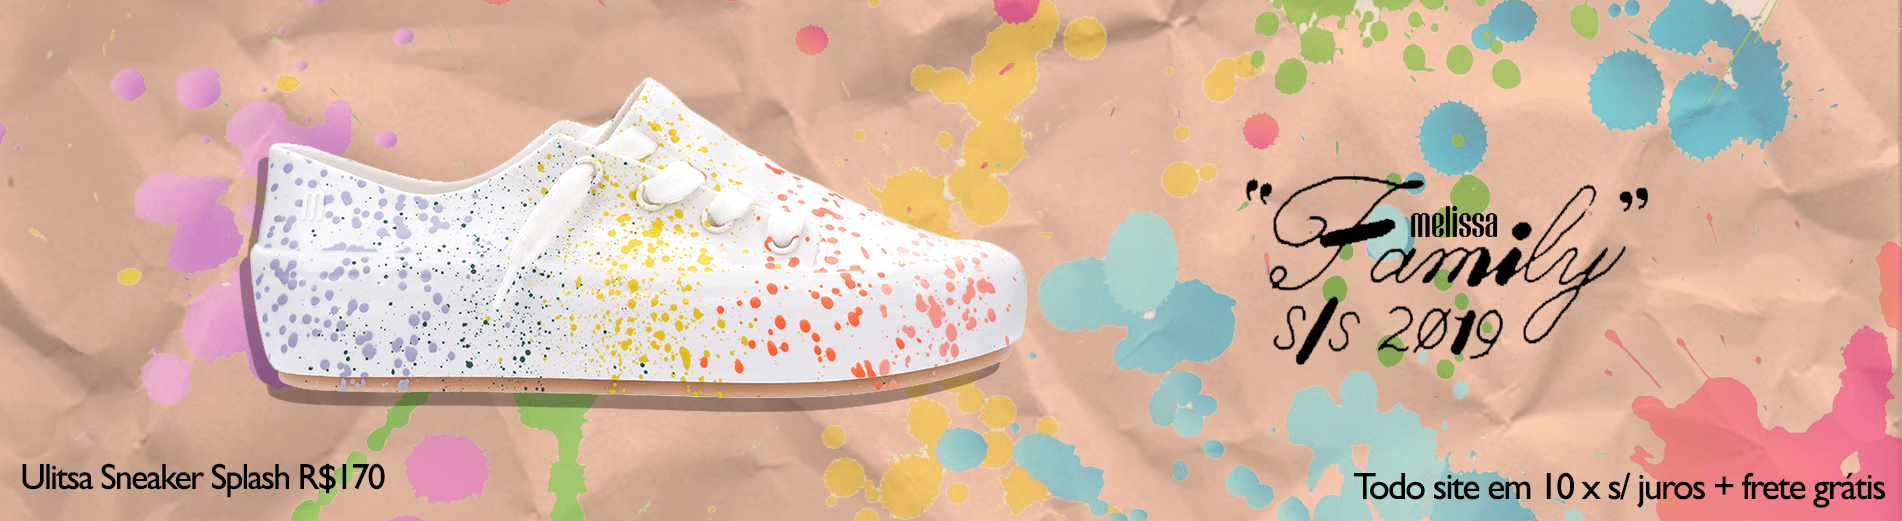 Ulitsa Sneaker Splash